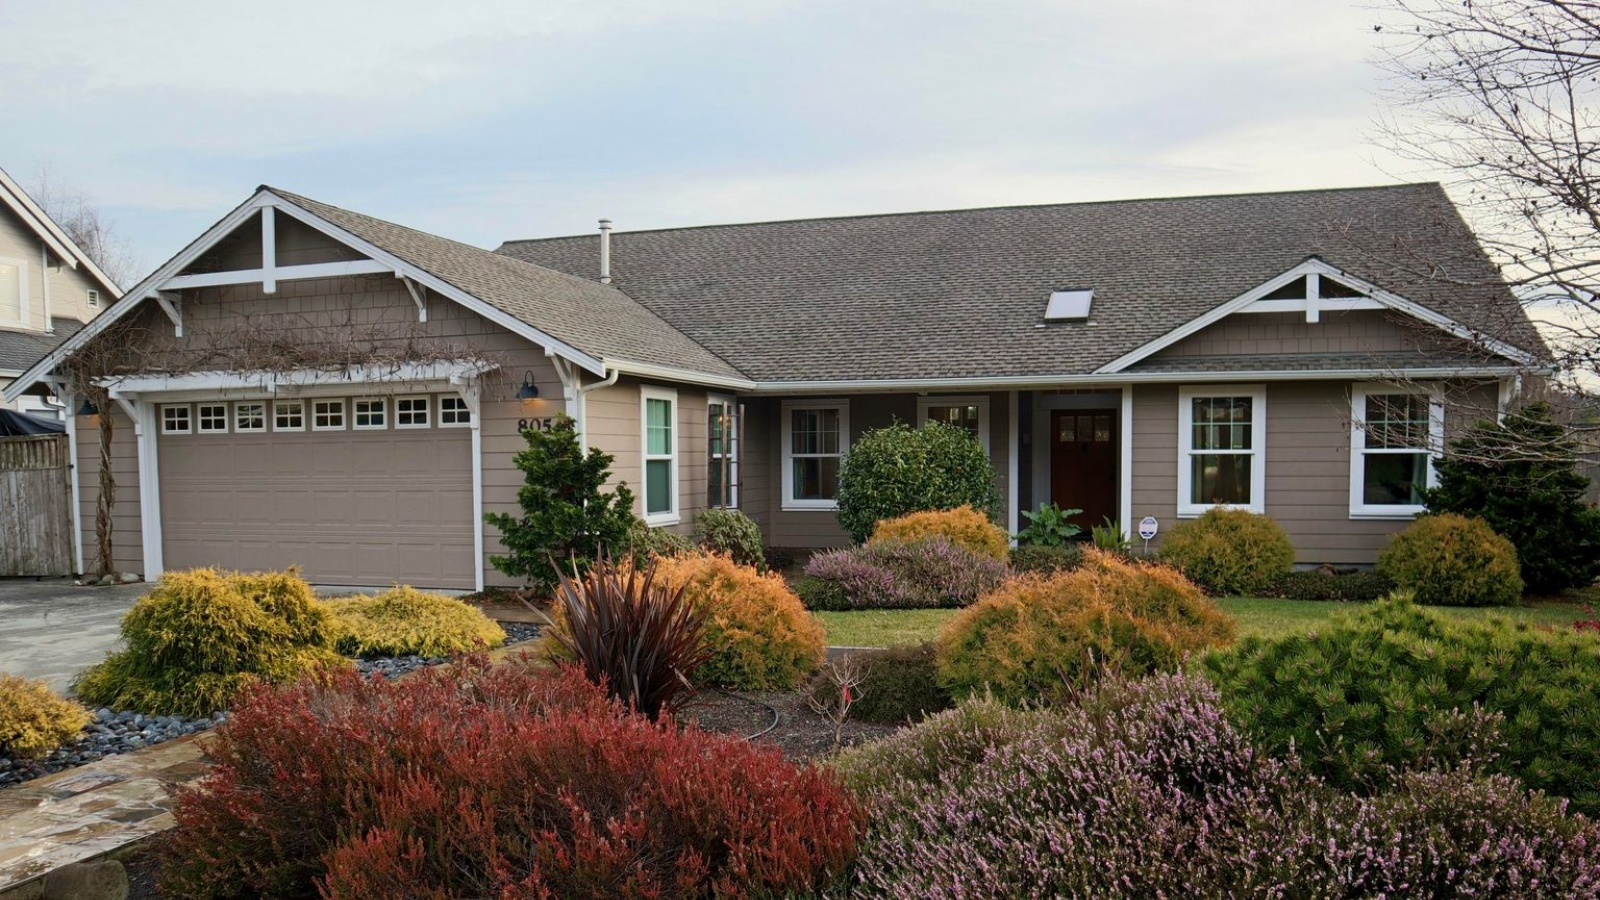 805 Holman Way, Fortuna, California 95540, ,Home,Sold,Holman,1012